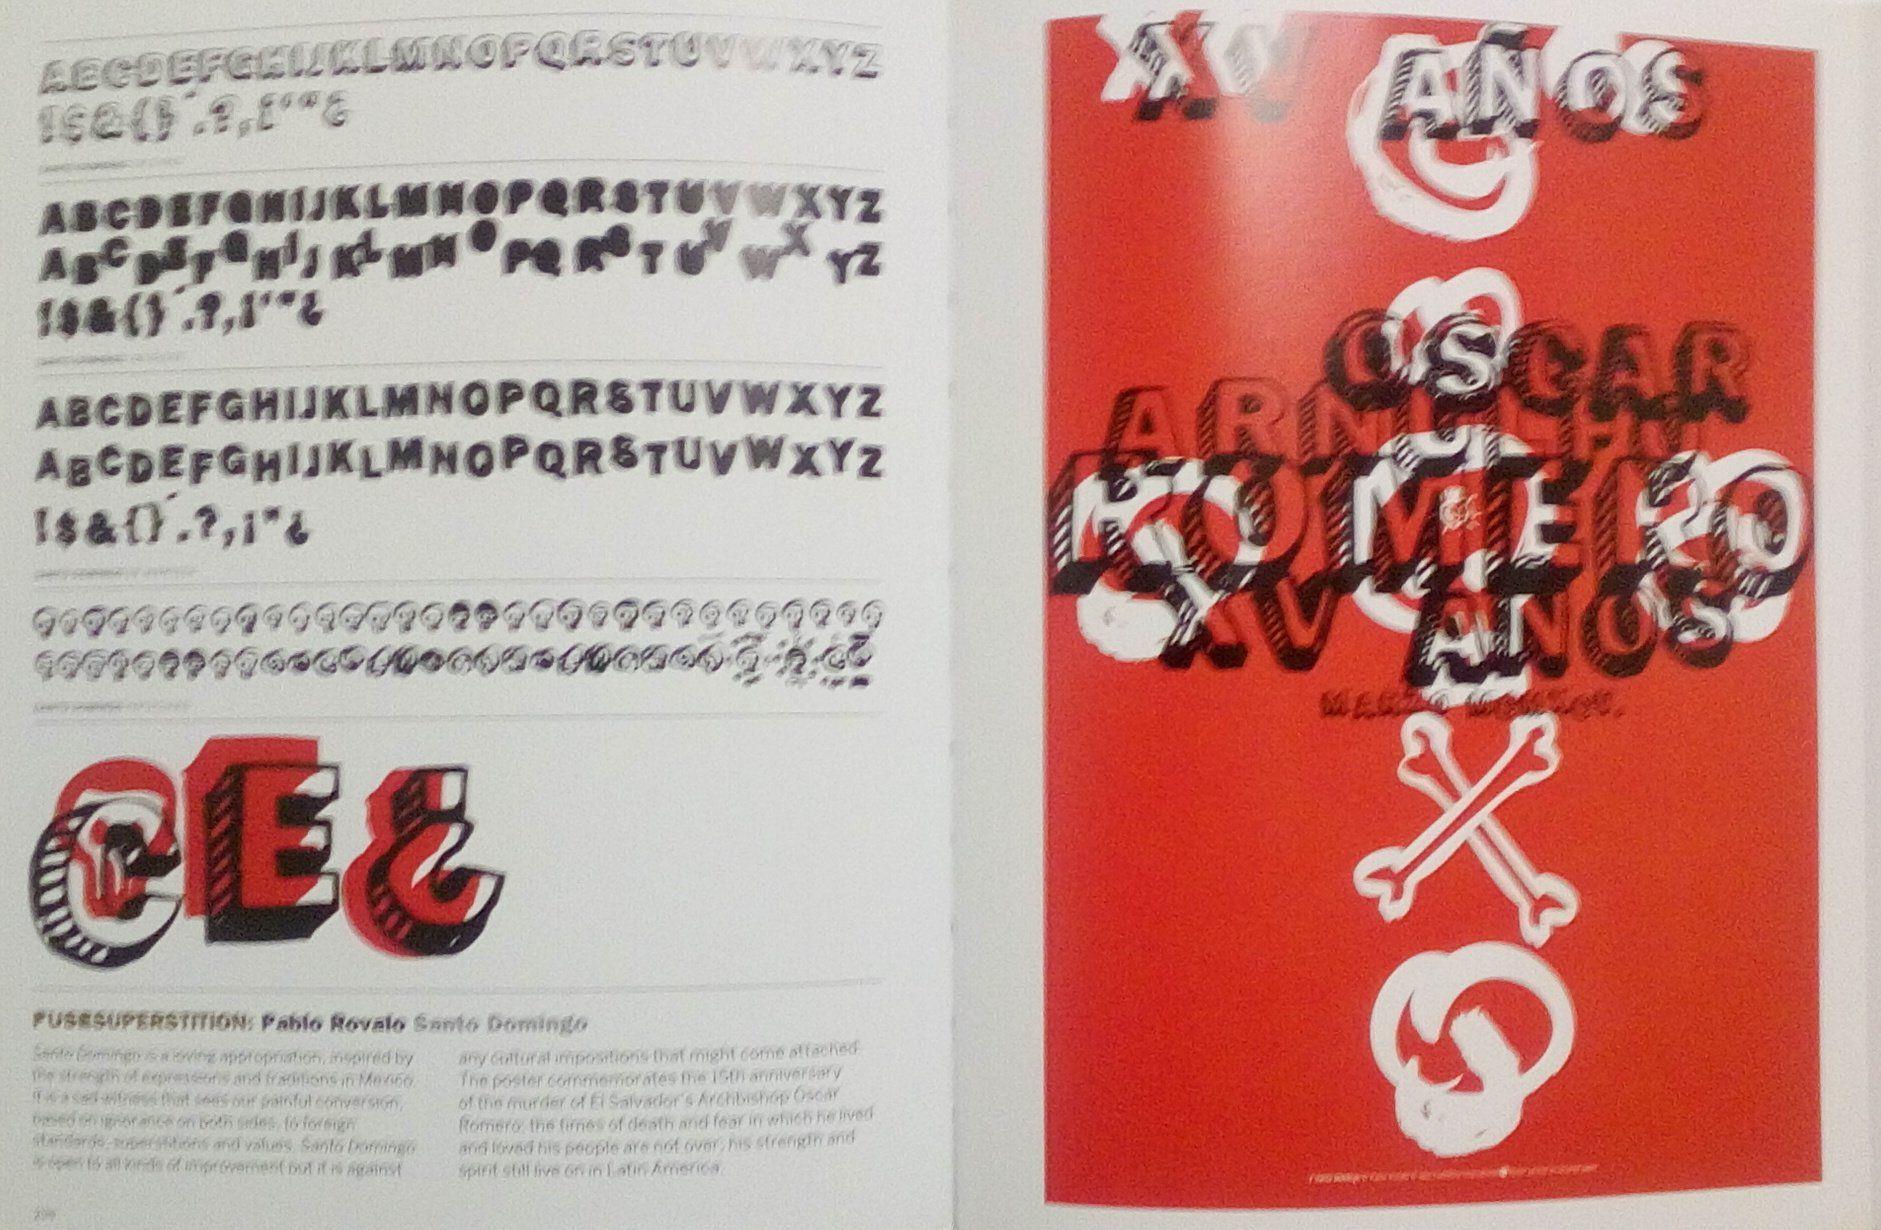 Fuse 1 20 Ediz Italiana Spagnola E Portoghese Sponsored Ediz Fuse Portoghese Spagnola Nel 2020 Copertina Portoghese Apprendimento